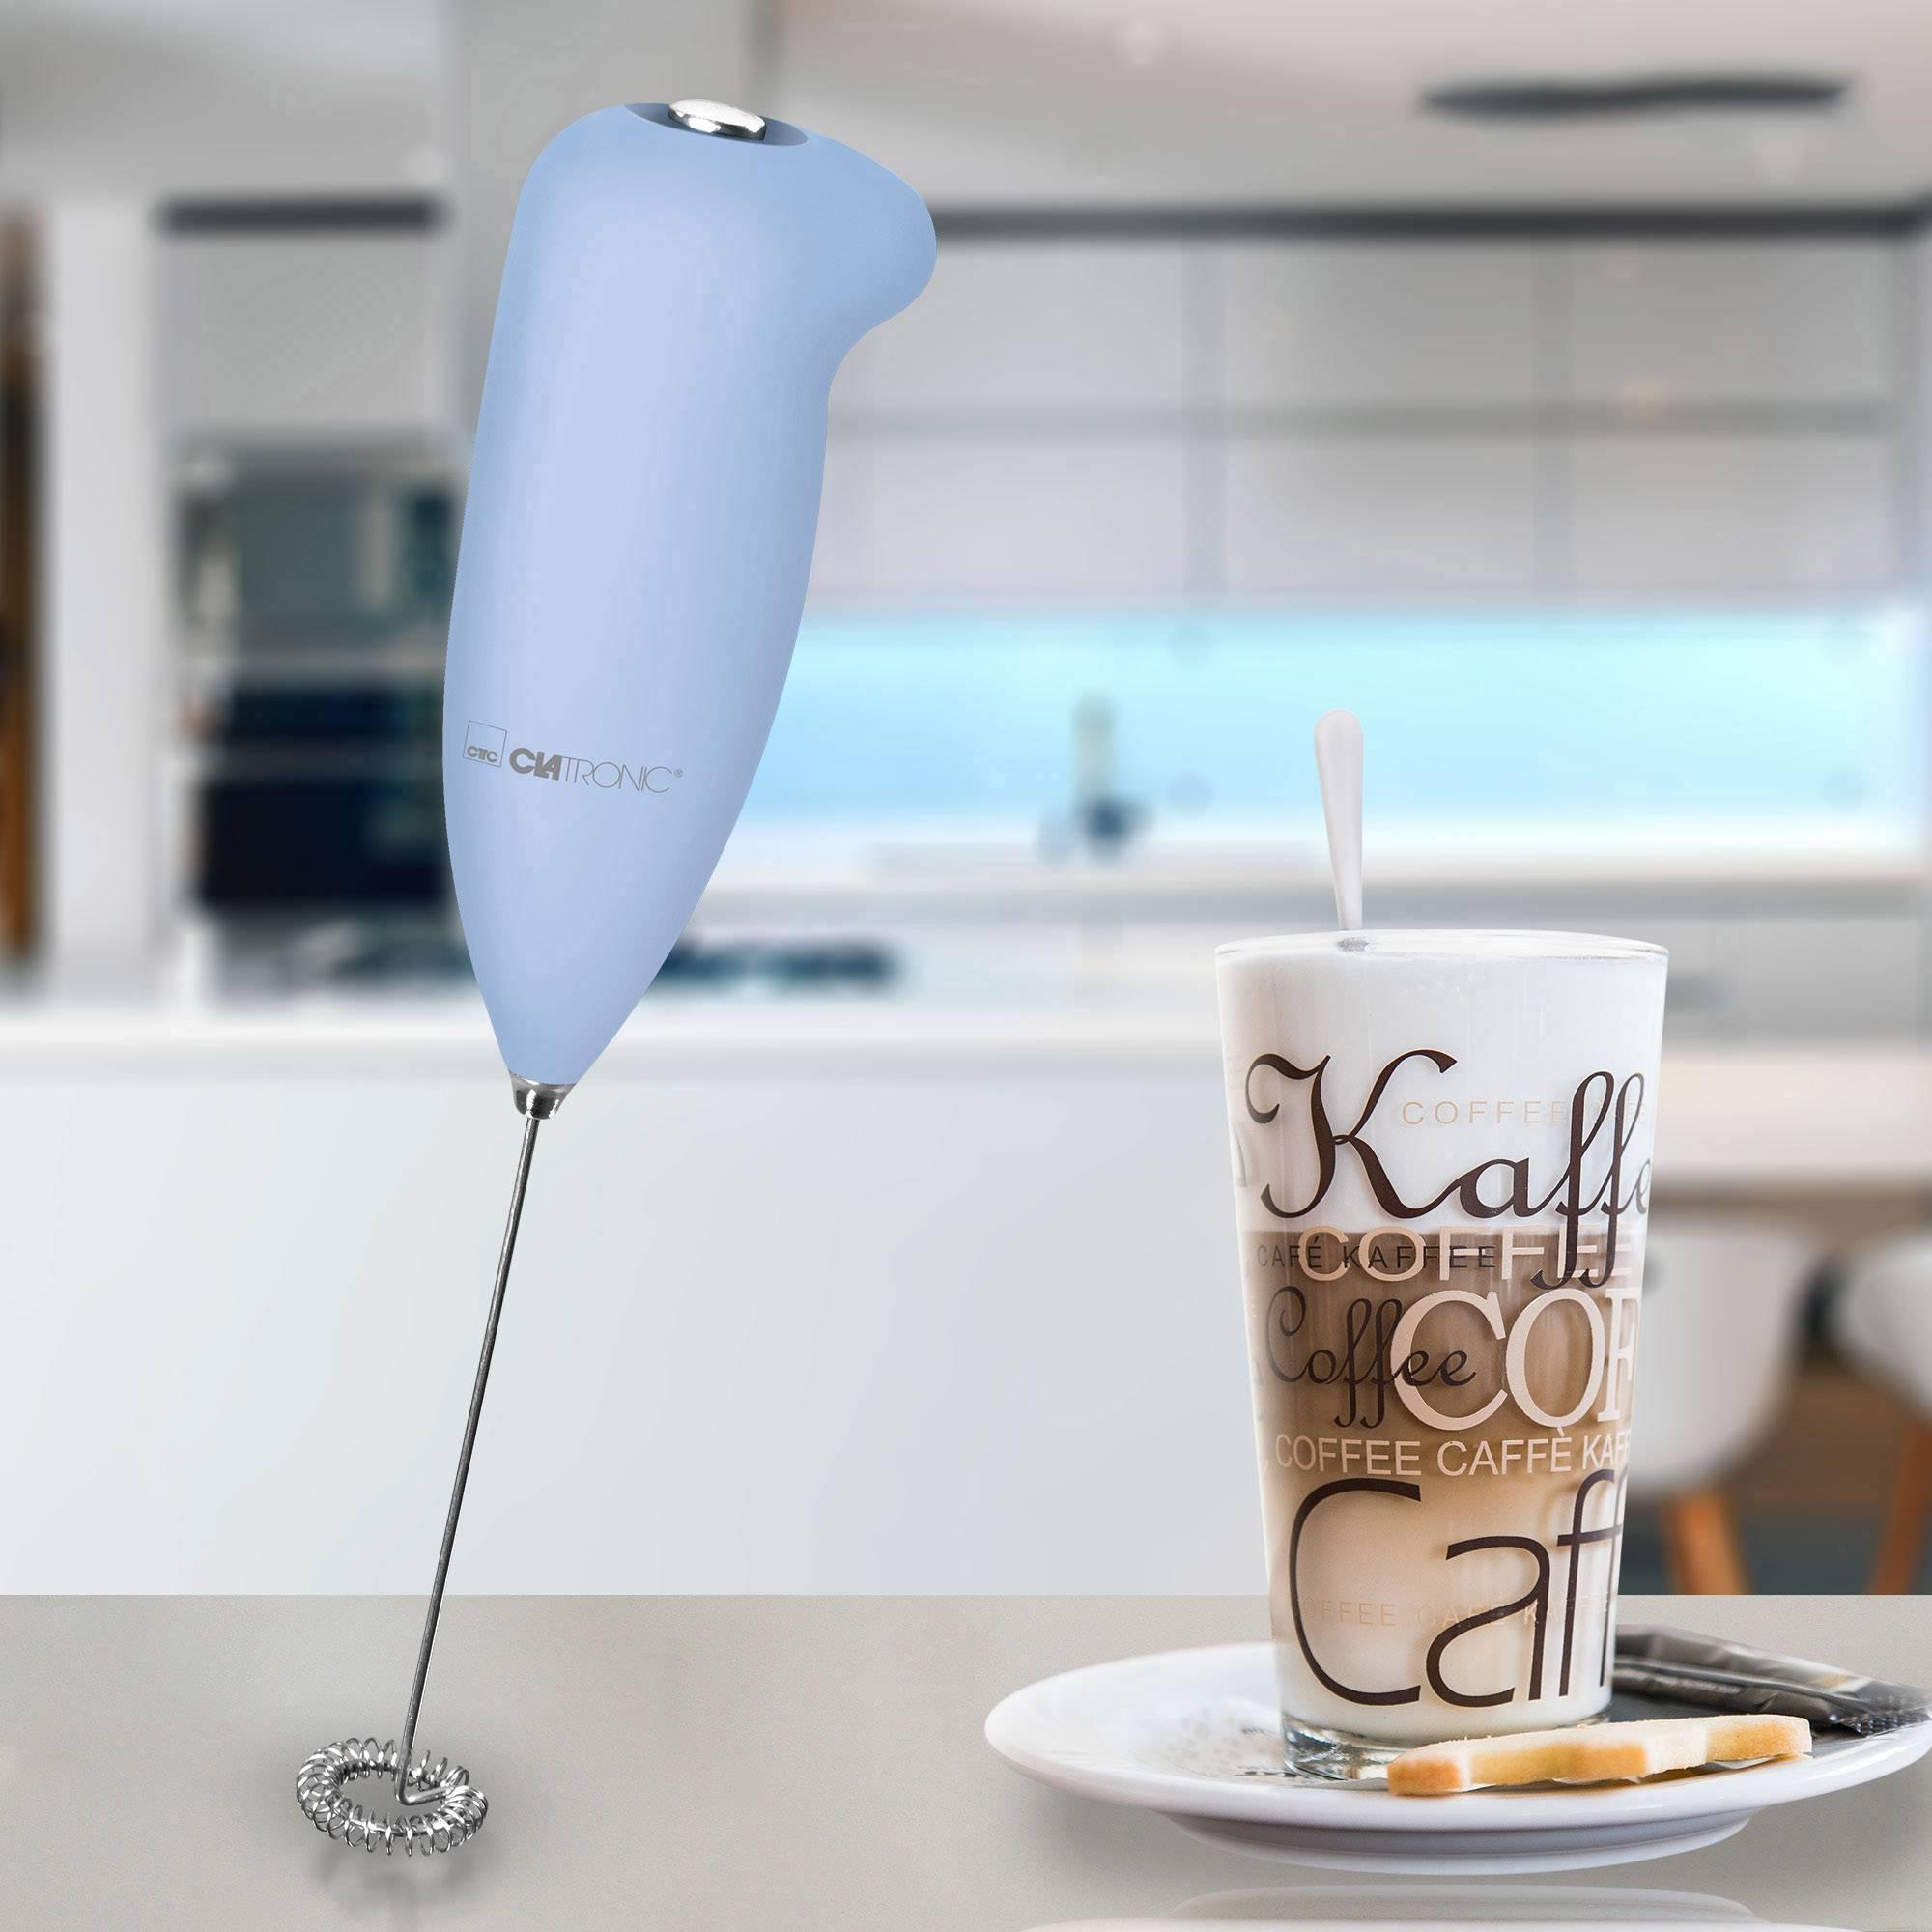 Clatronic MS 3089 M 263917 naprava za penjenje mleka svetlo modra